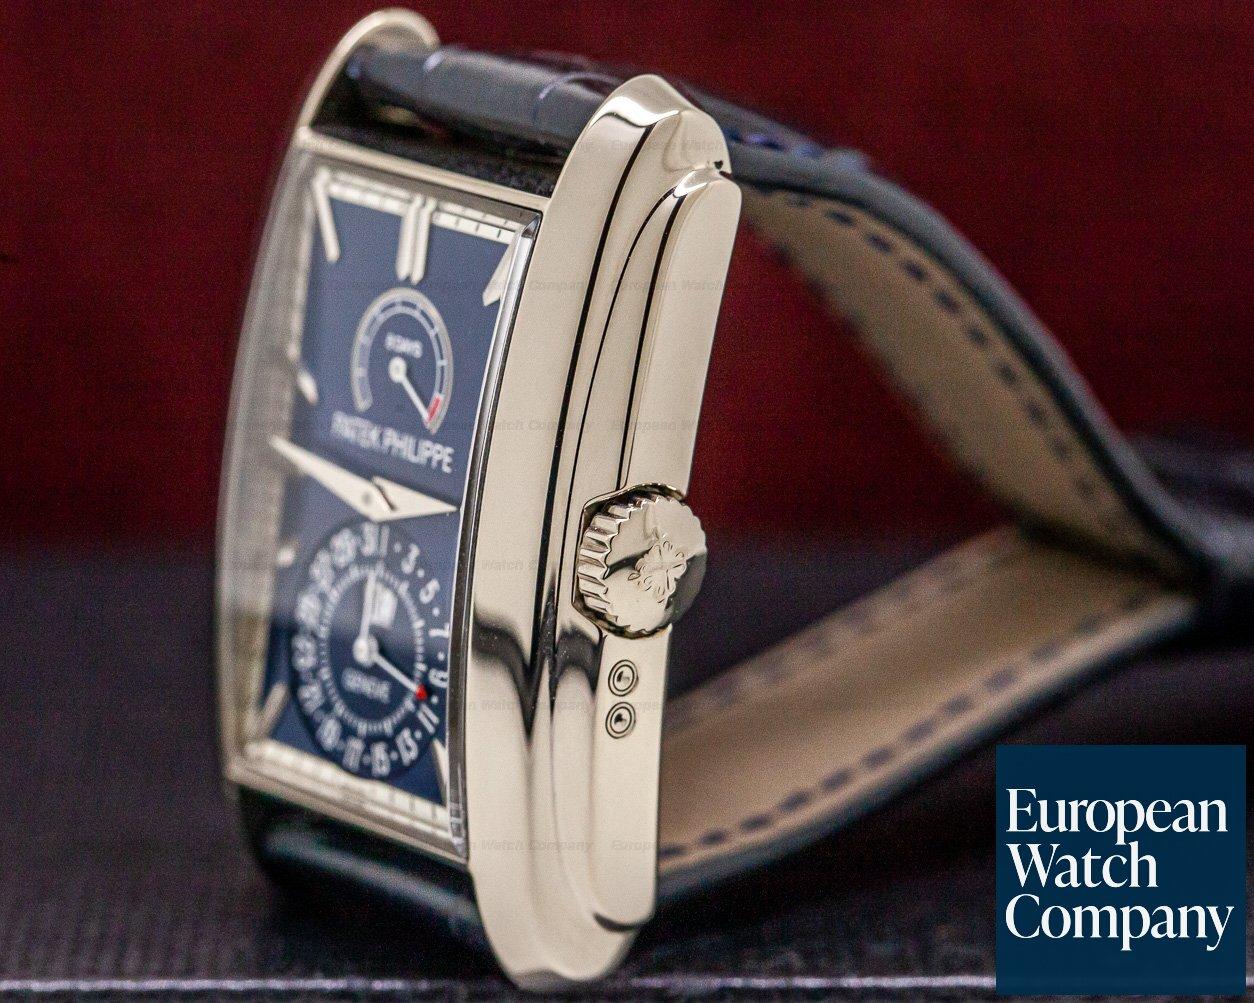 Patek Philippe 5200G-001 Gondolo 8 Day Manual Wind Blue Dial 18K White Gold